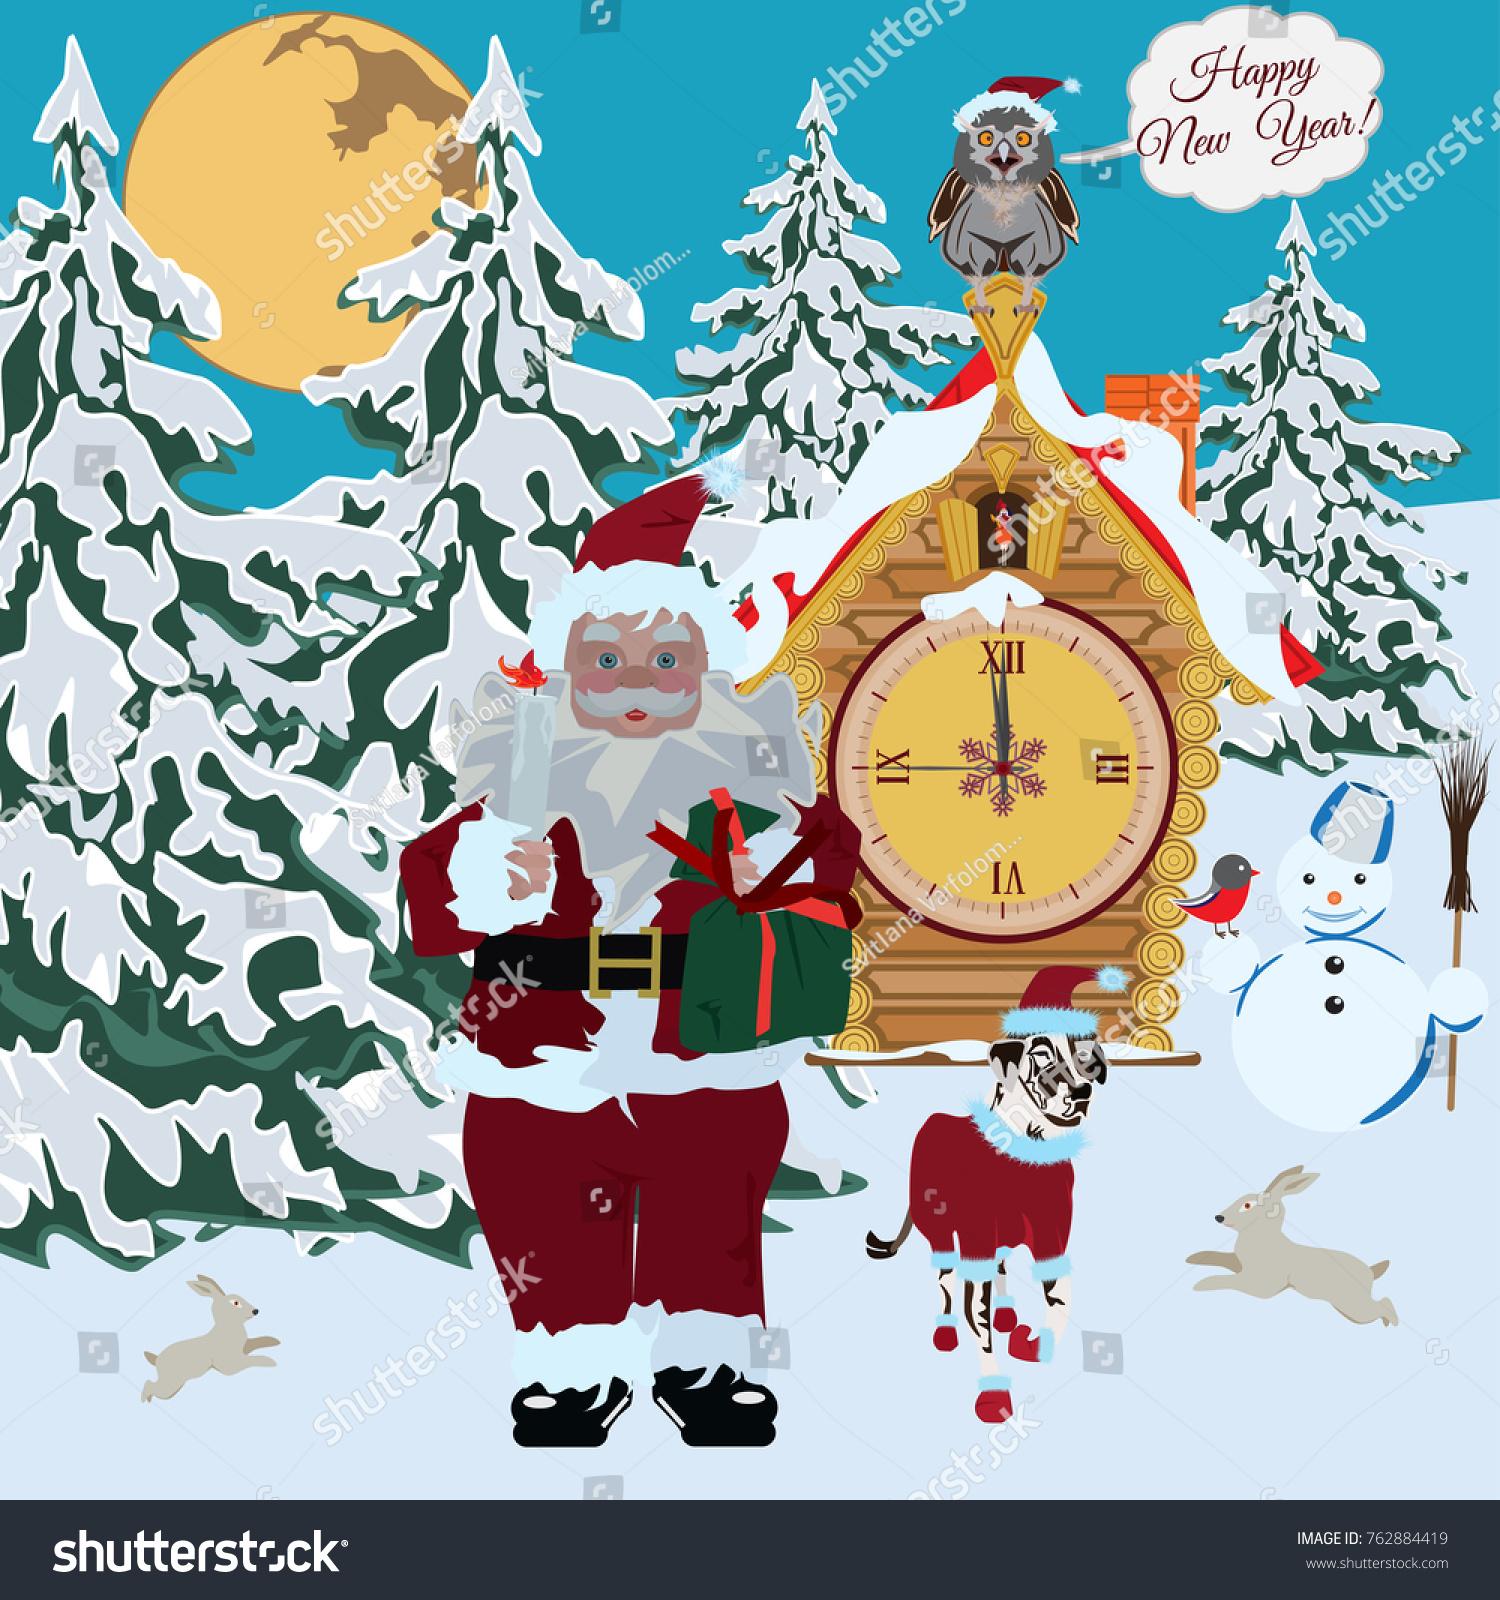 Happy new year greeting card santa stock vector 762884419 shutterstock happy new year greeting card with santa claus snowman rabbits owl sitting on kristyandbryce Gallery